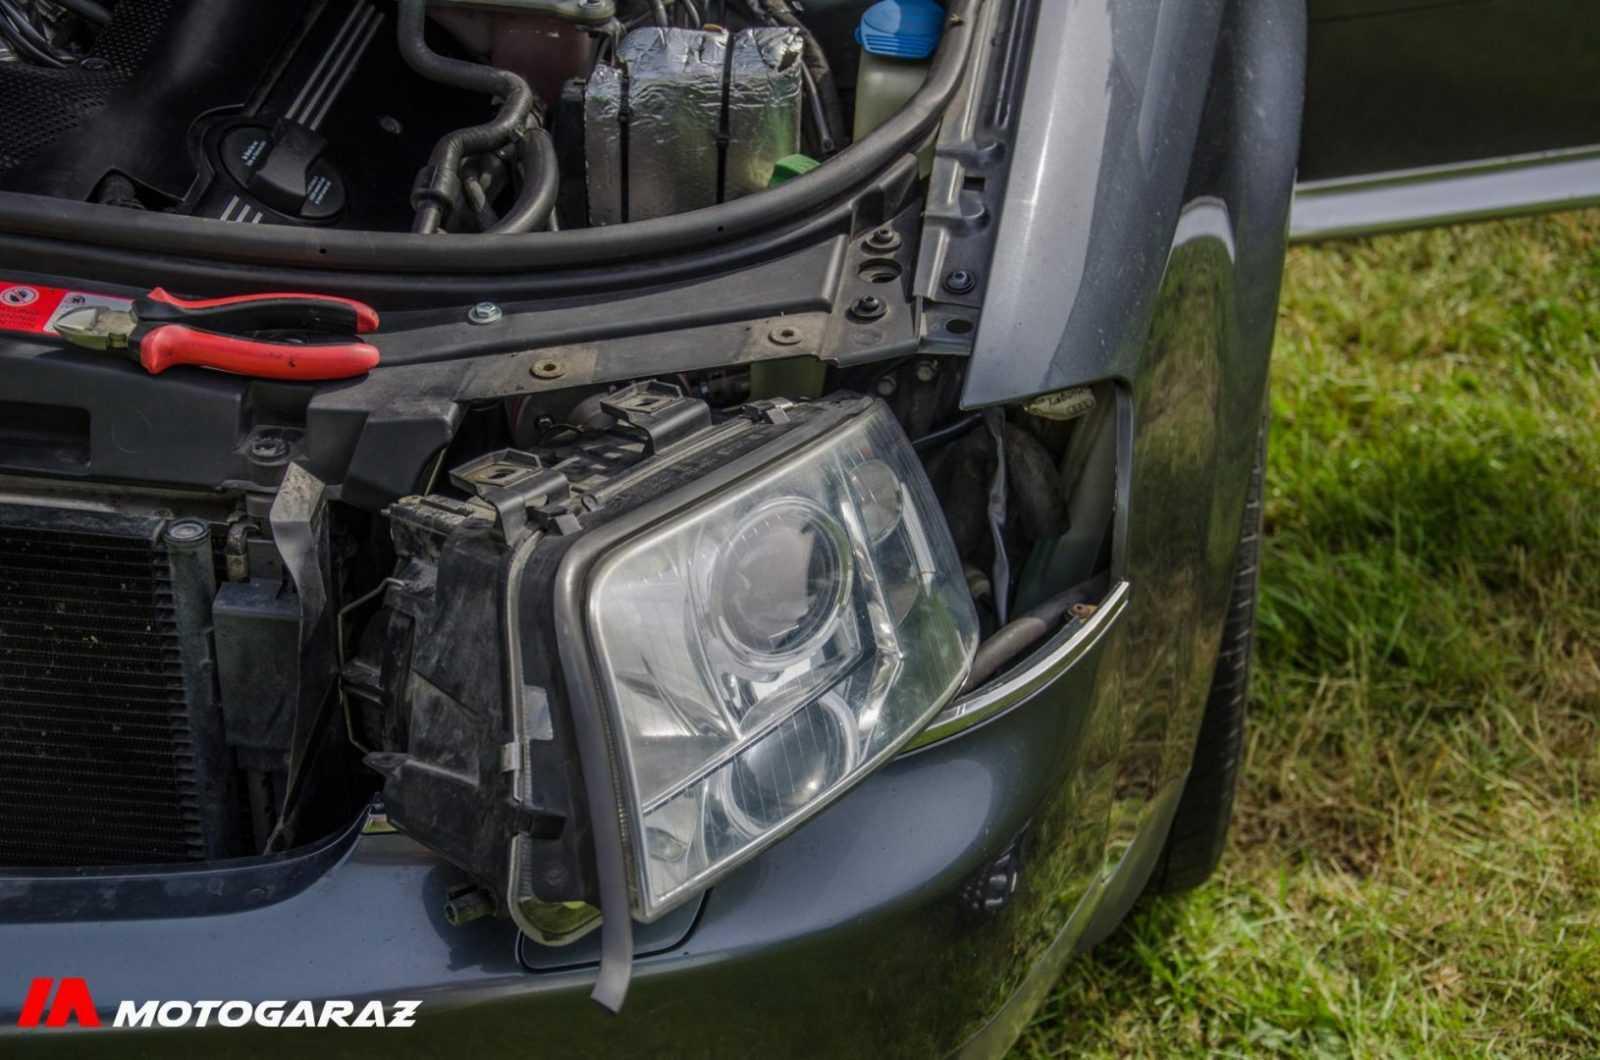 Wymiana lampy Audi a6c5 - fot. nr 11